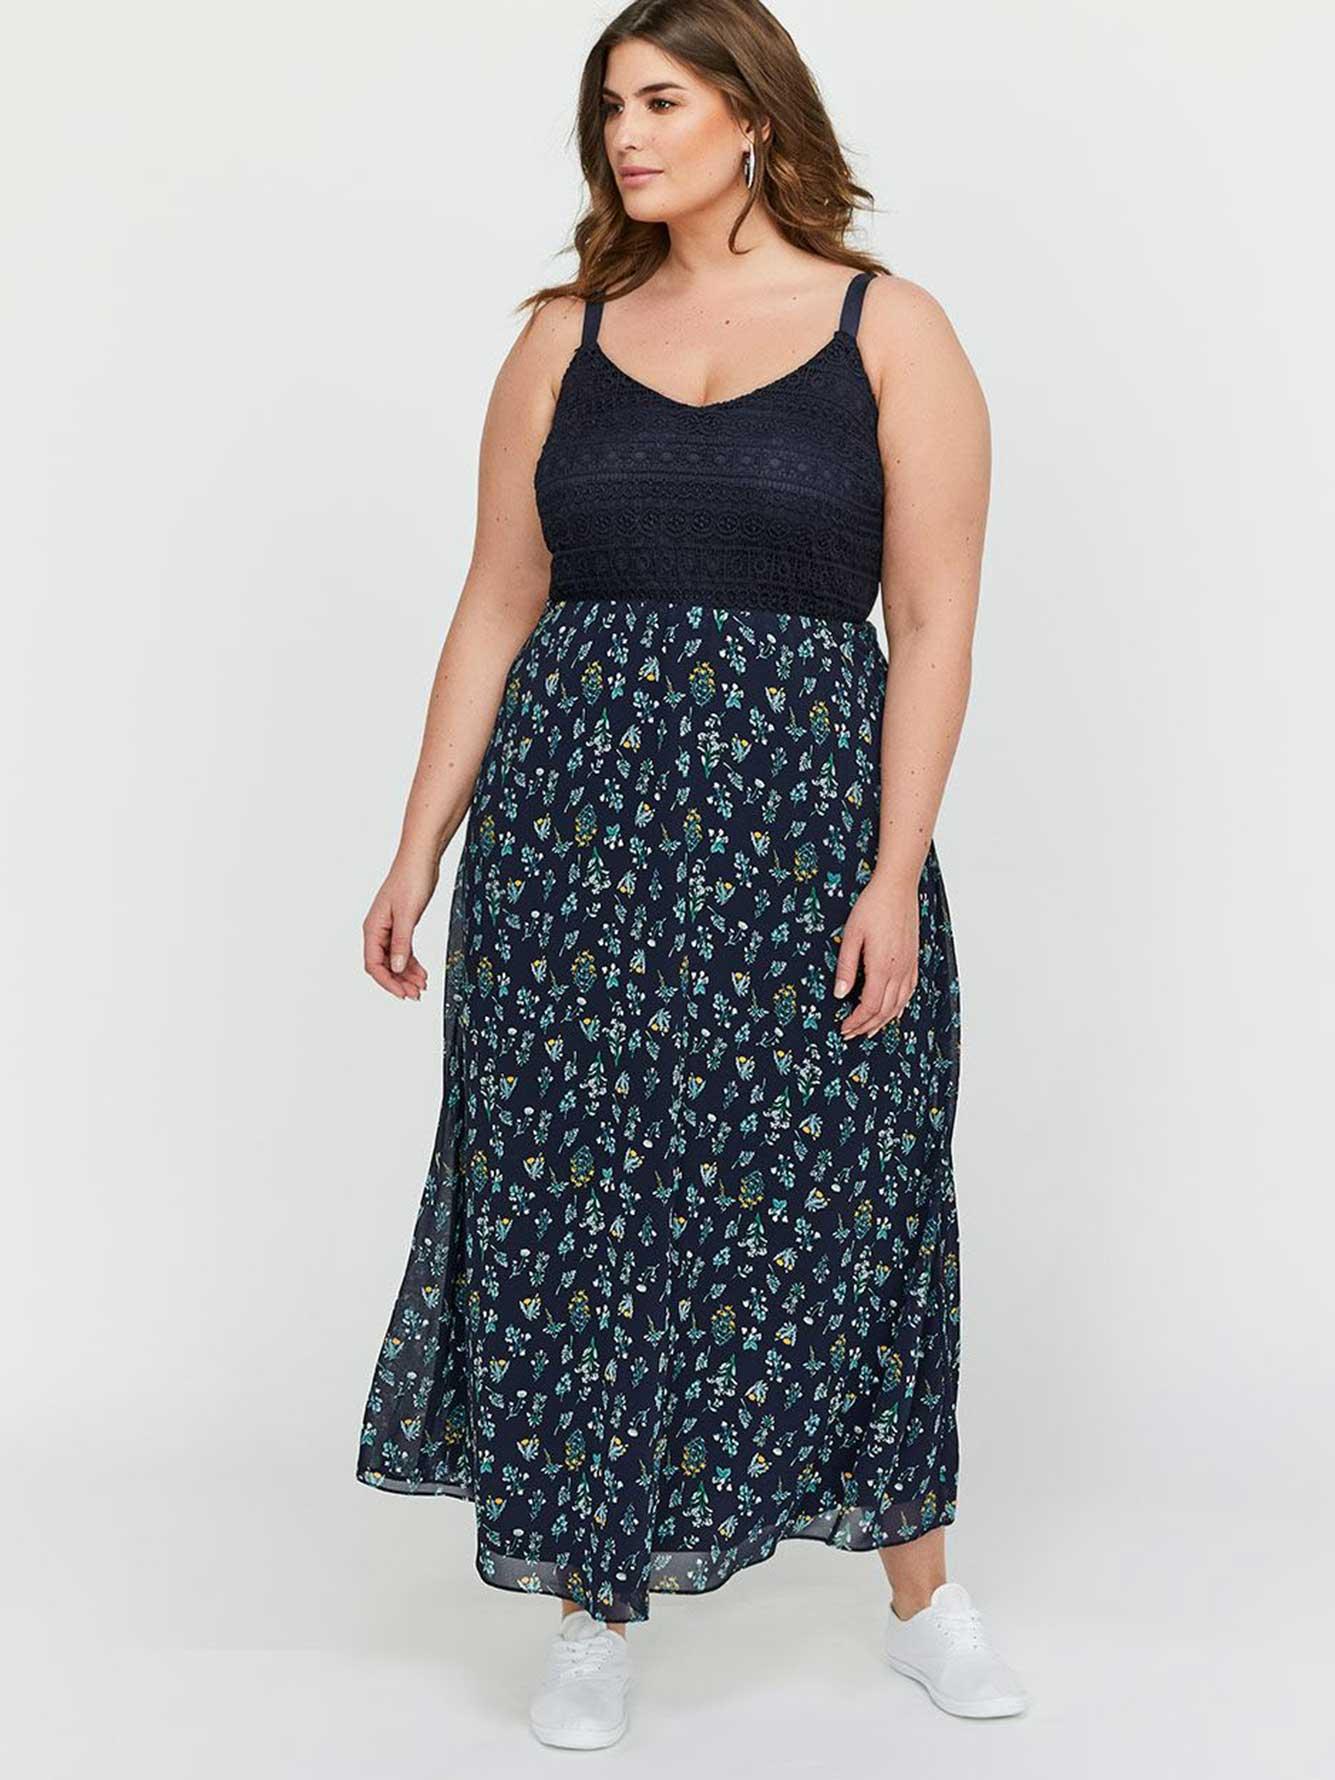 09ad0ba3cb Michel Studio A-Line Empire Waist Mixed Fabric Maxi Dress | Addition ...